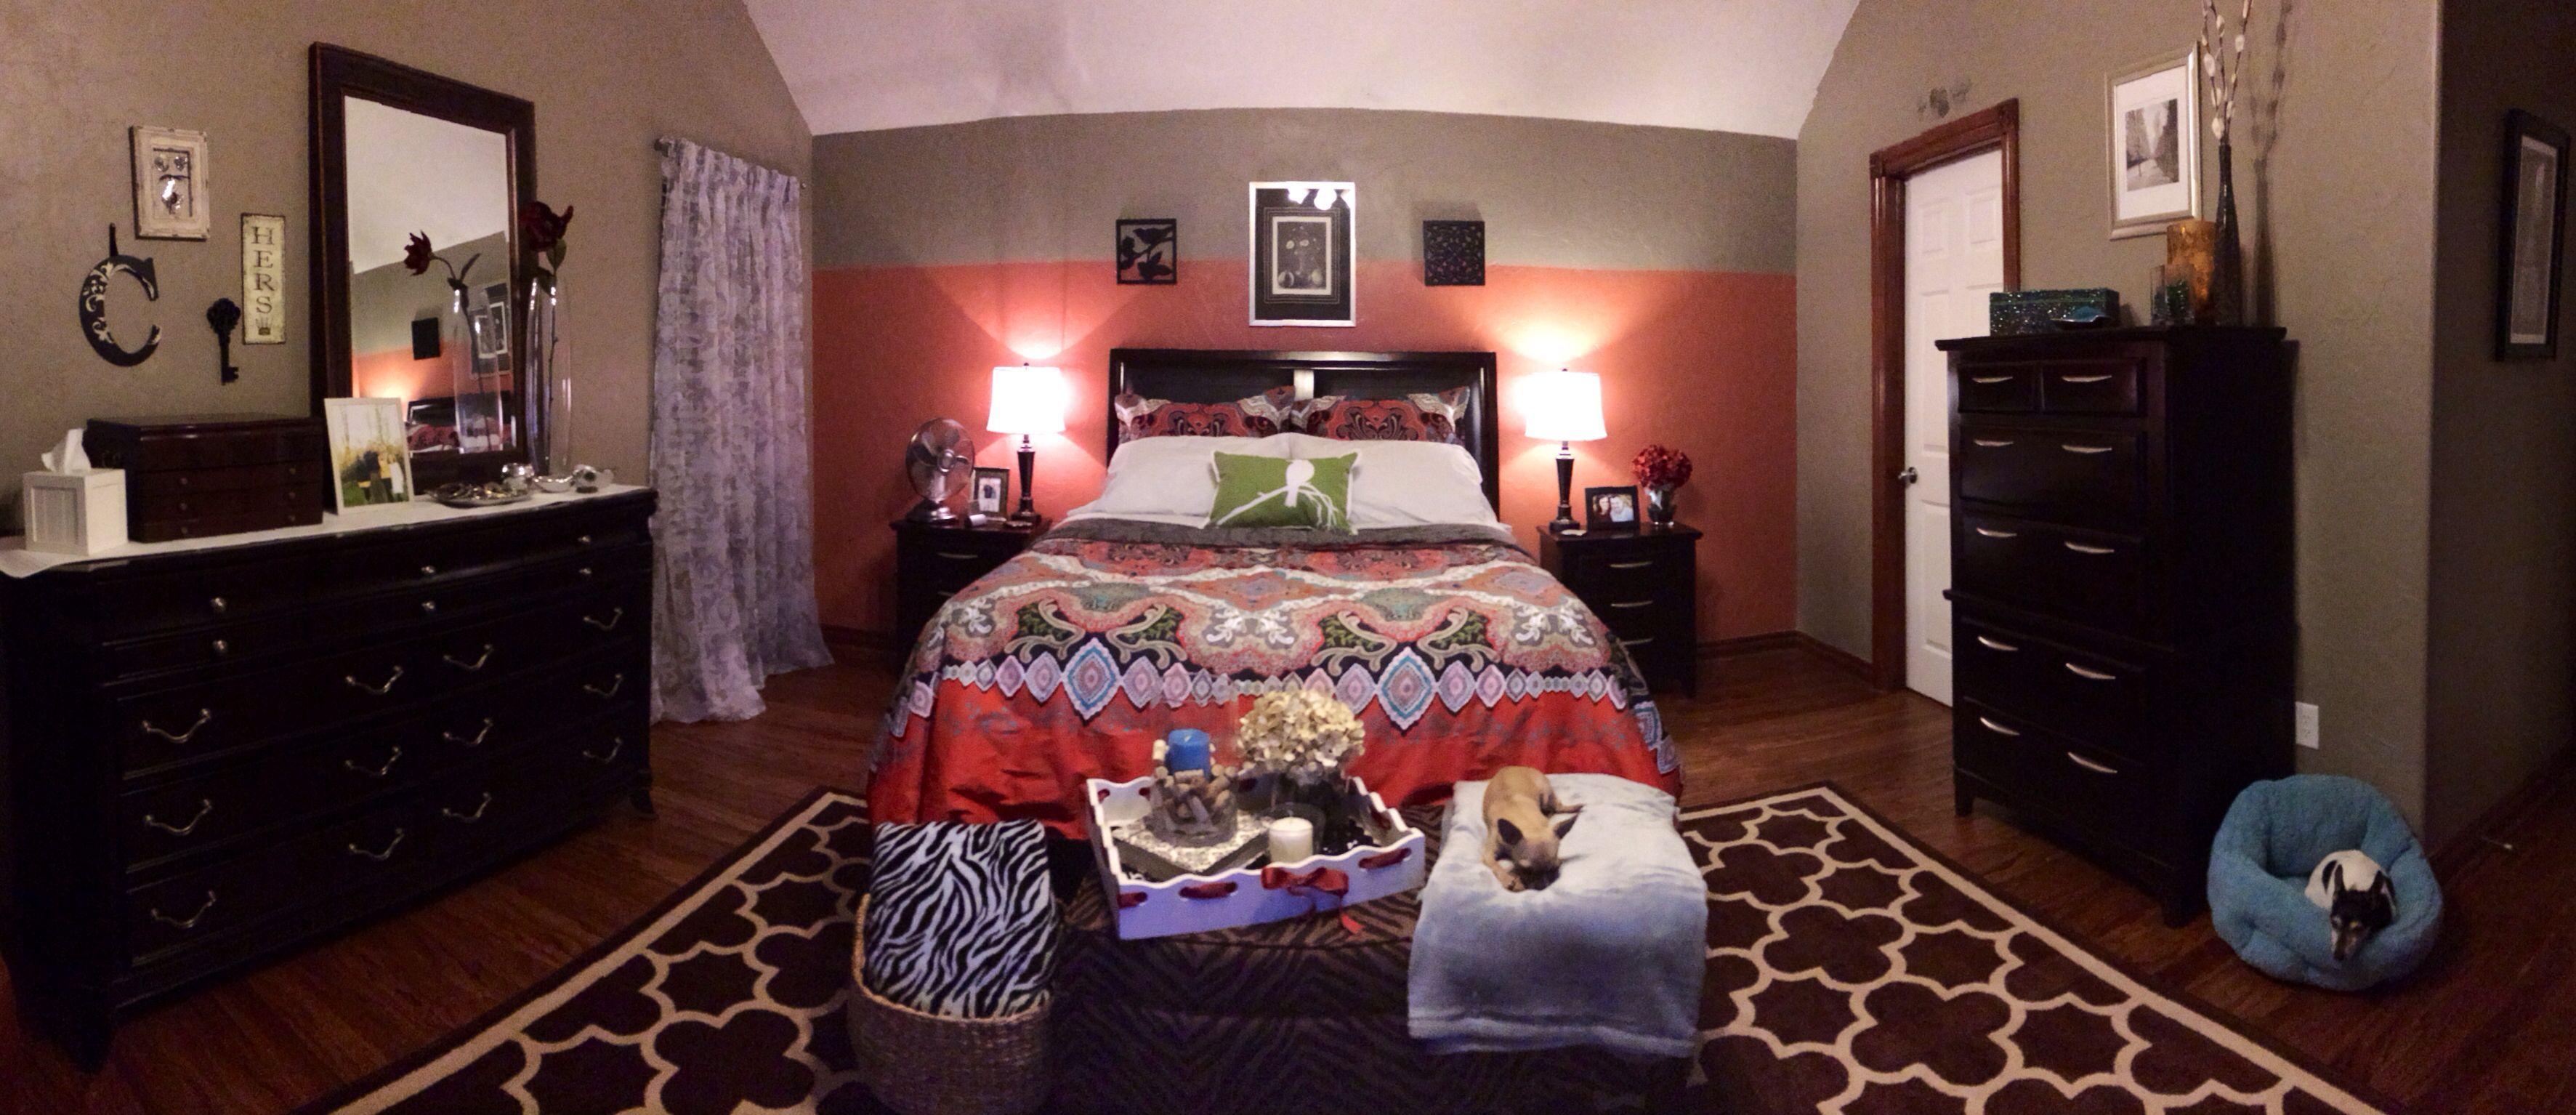 Sensational Master Bedroom Dresser With Mirror Placement Master Download Free Architecture Designs Viewormadebymaigaardcom